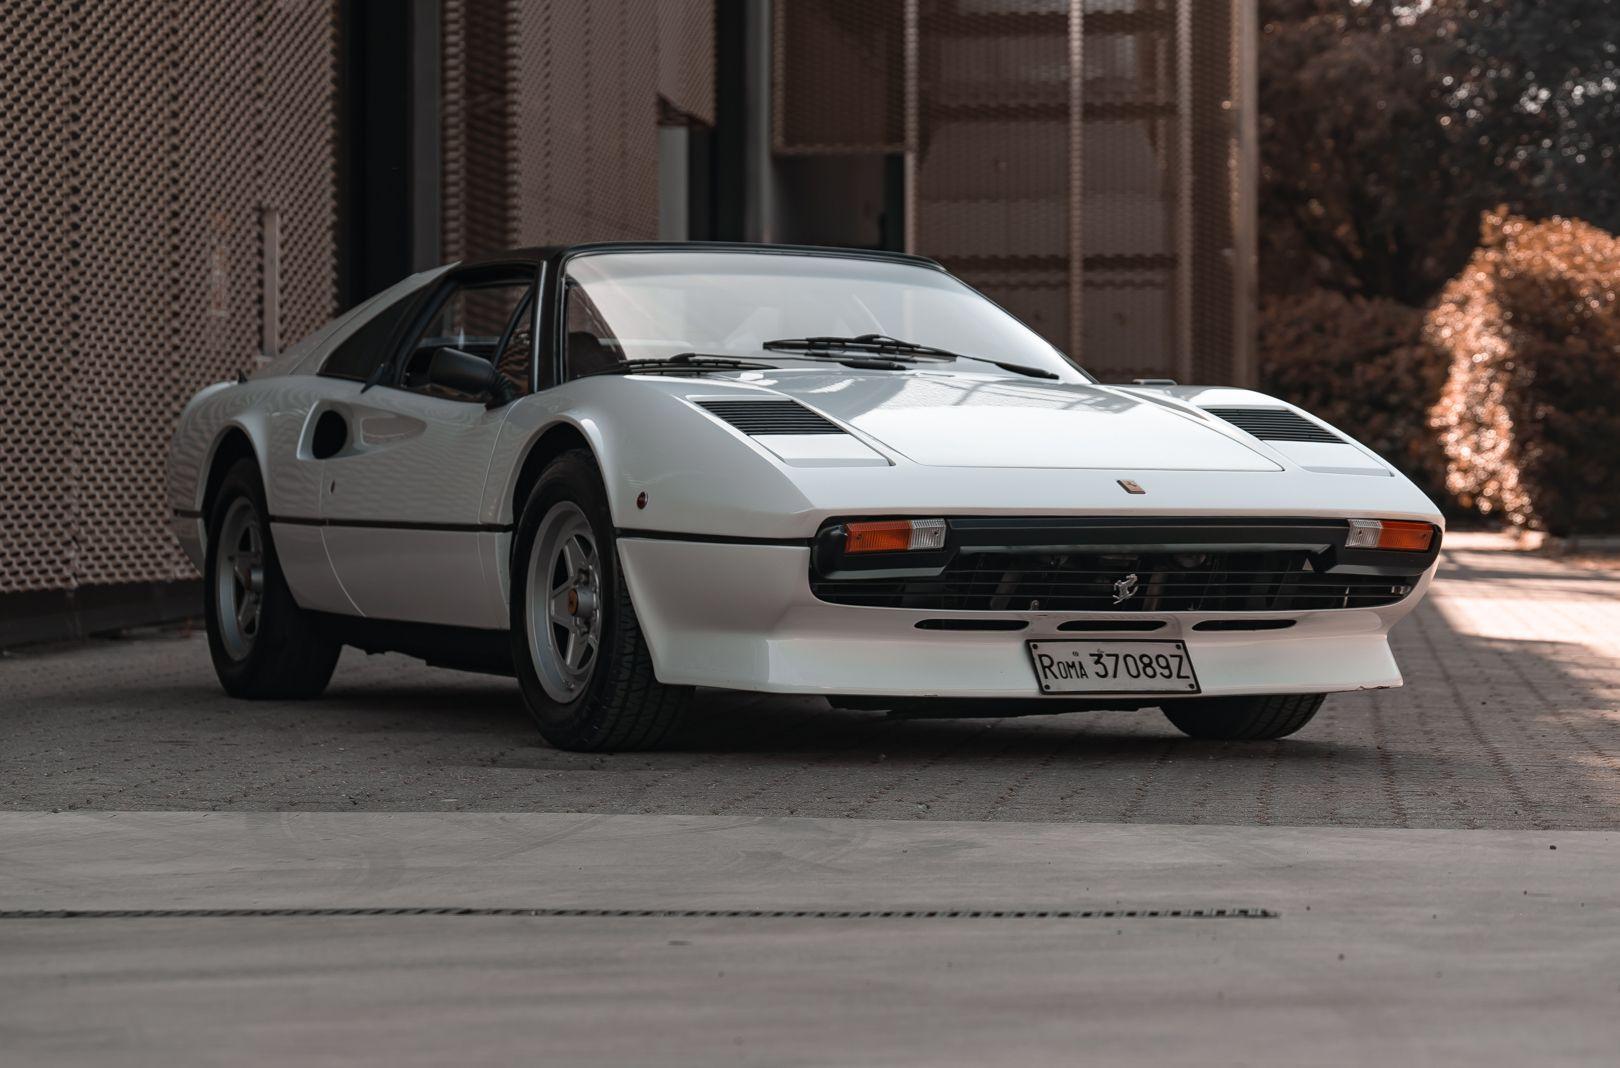 1982 Ferrari 208 GTS Carburatori 75992